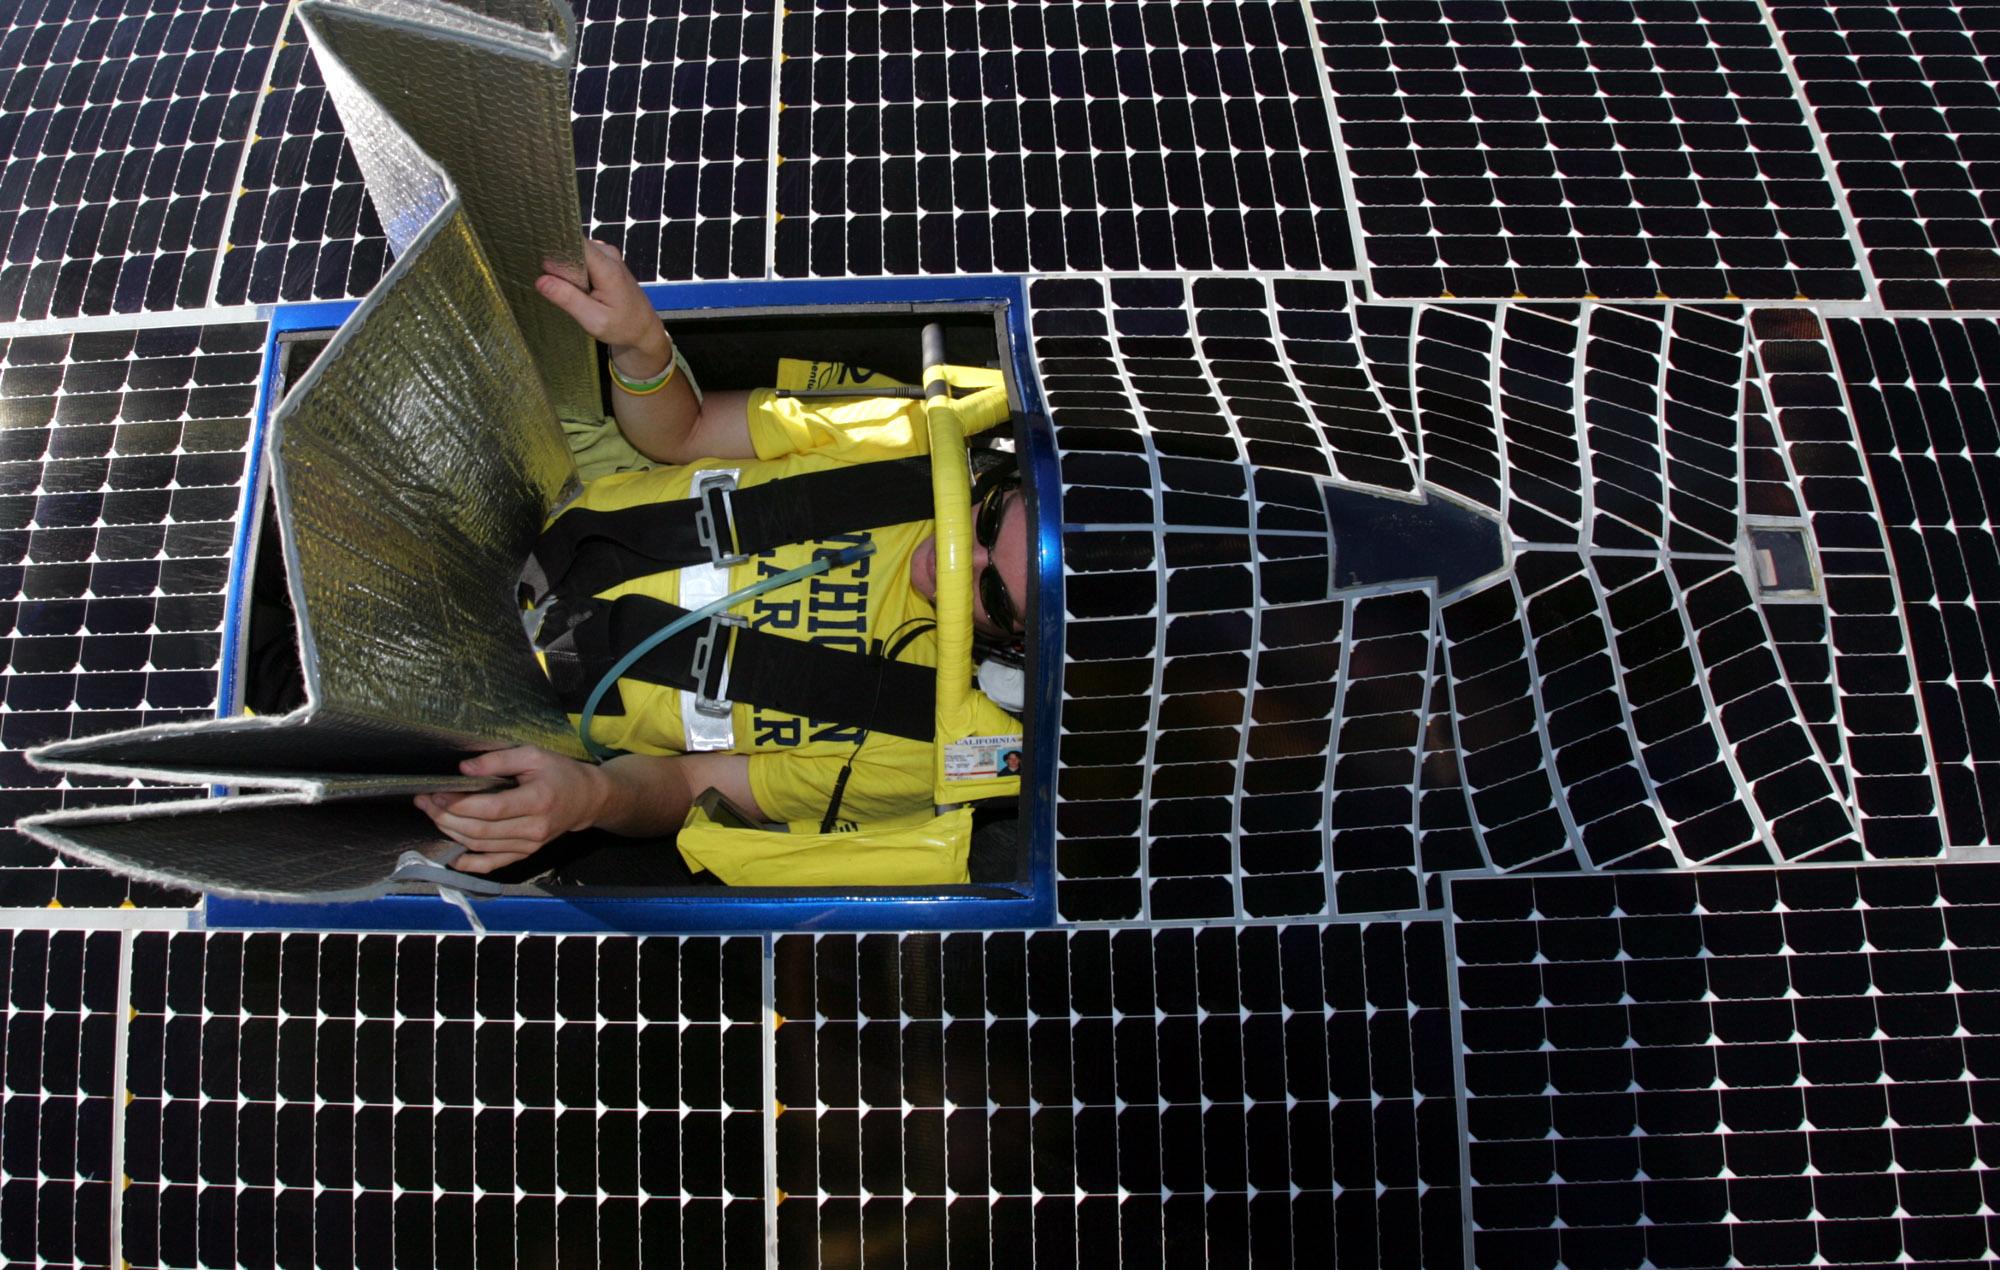 solar_car.jpg